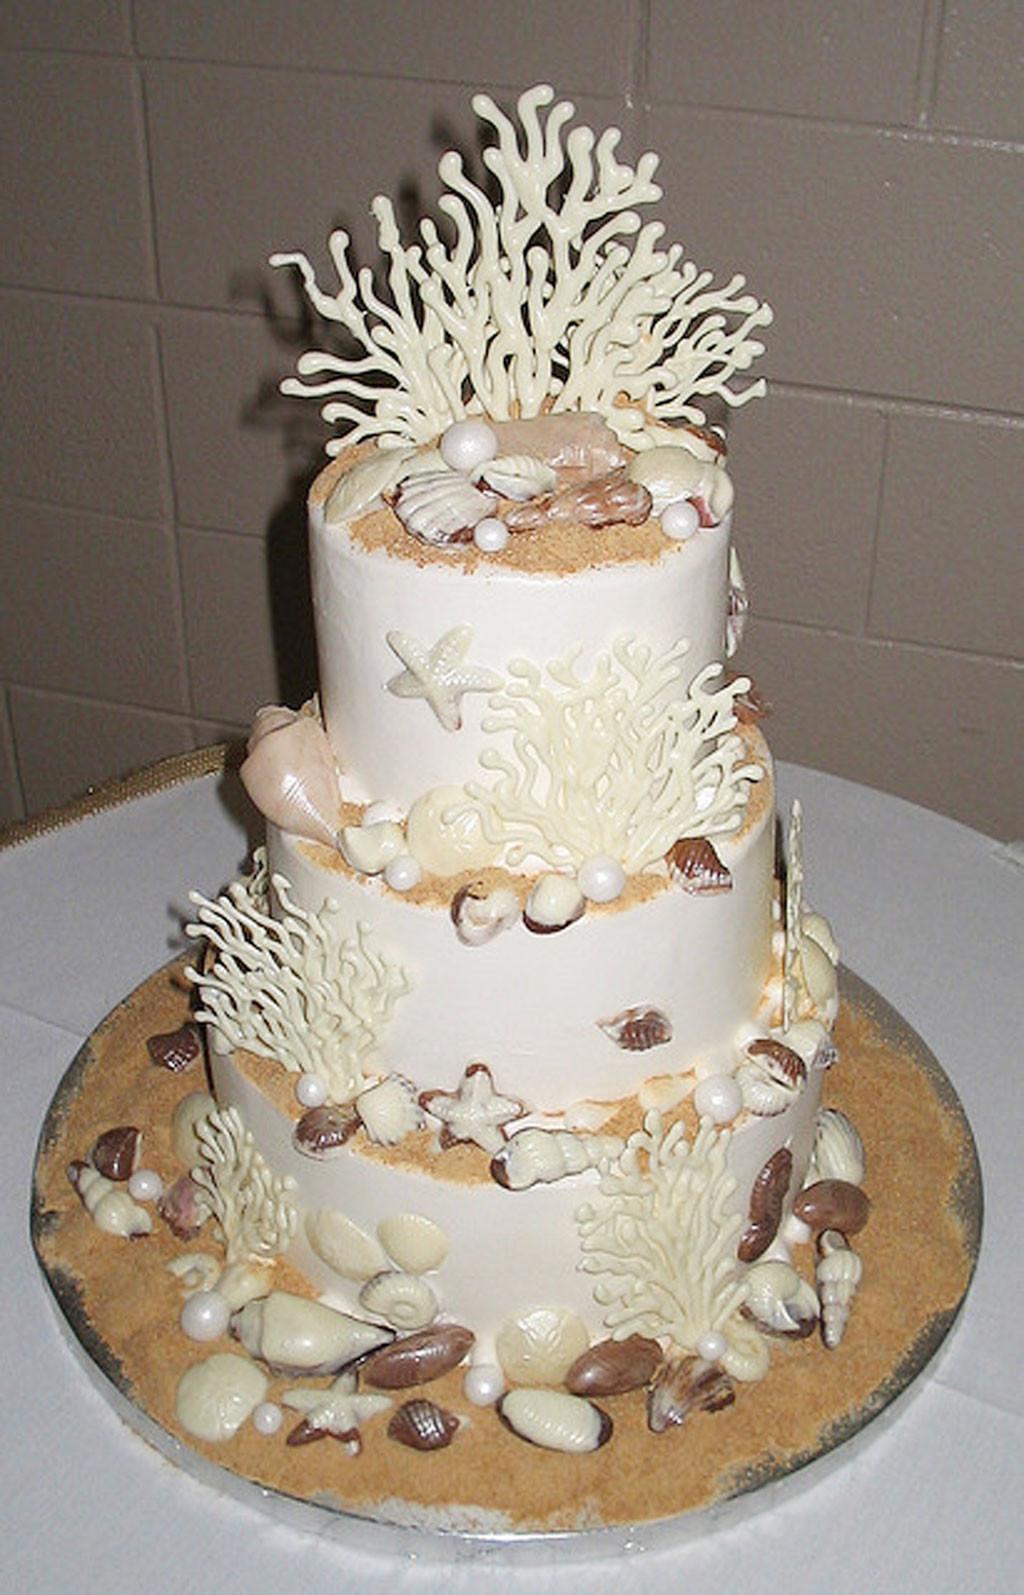 Seashell Wedding Cakes  Seashell Wedding Cakes Ideas Wedding Cake Cake Ideas by